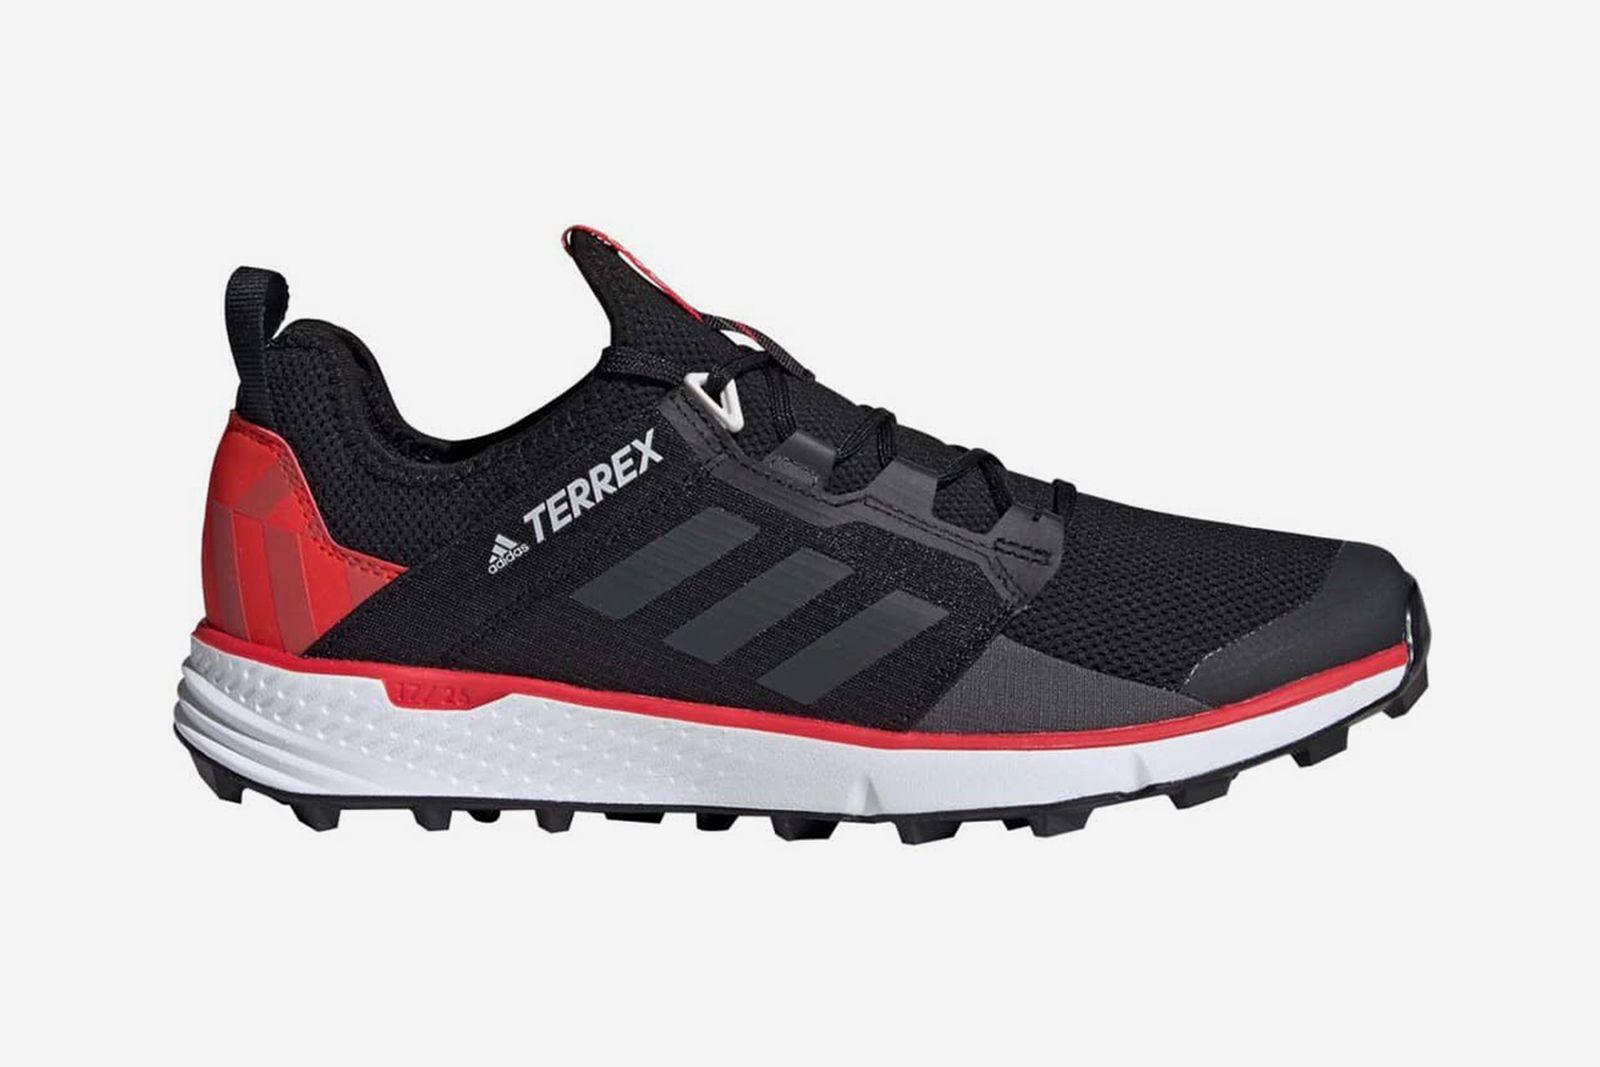 best-running-shoes-for-men-guide-adidas-terrex